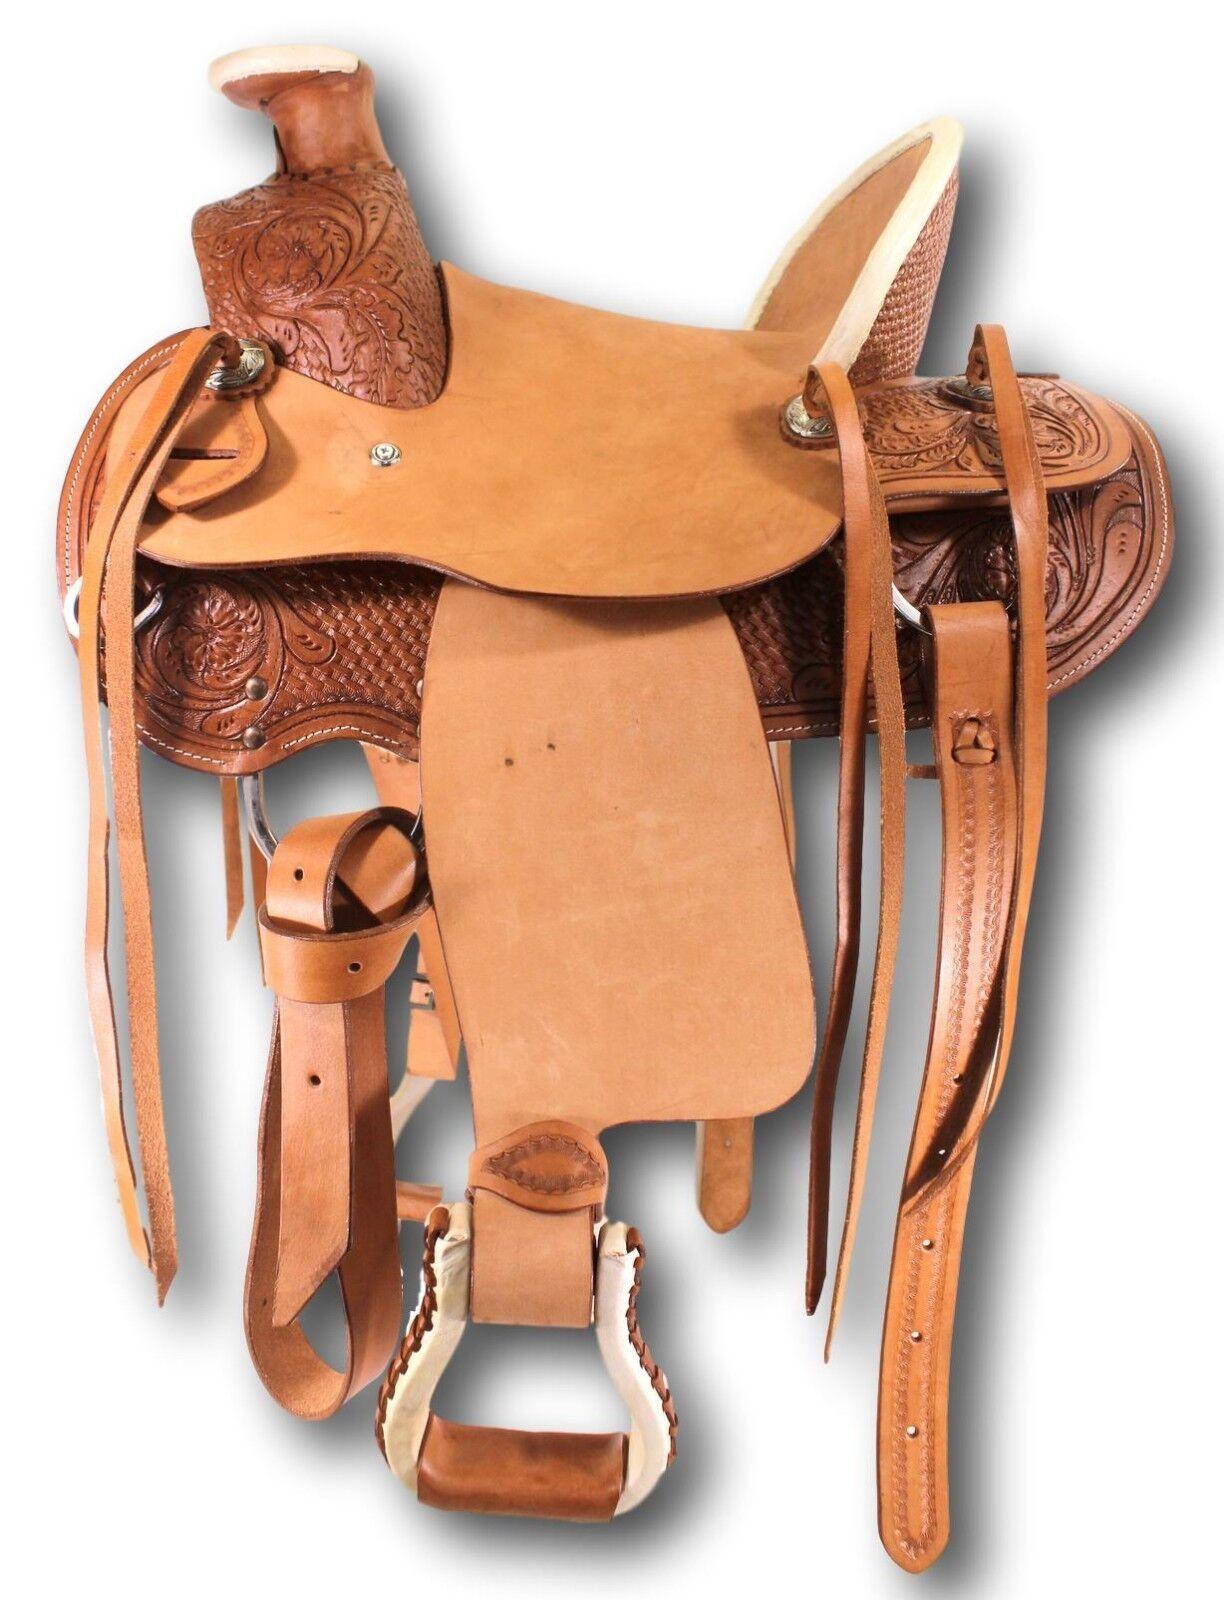 D.A. marca Kid's 12  De Cuero fileteado Wade PONY Silla Tachuela del caballo Equino